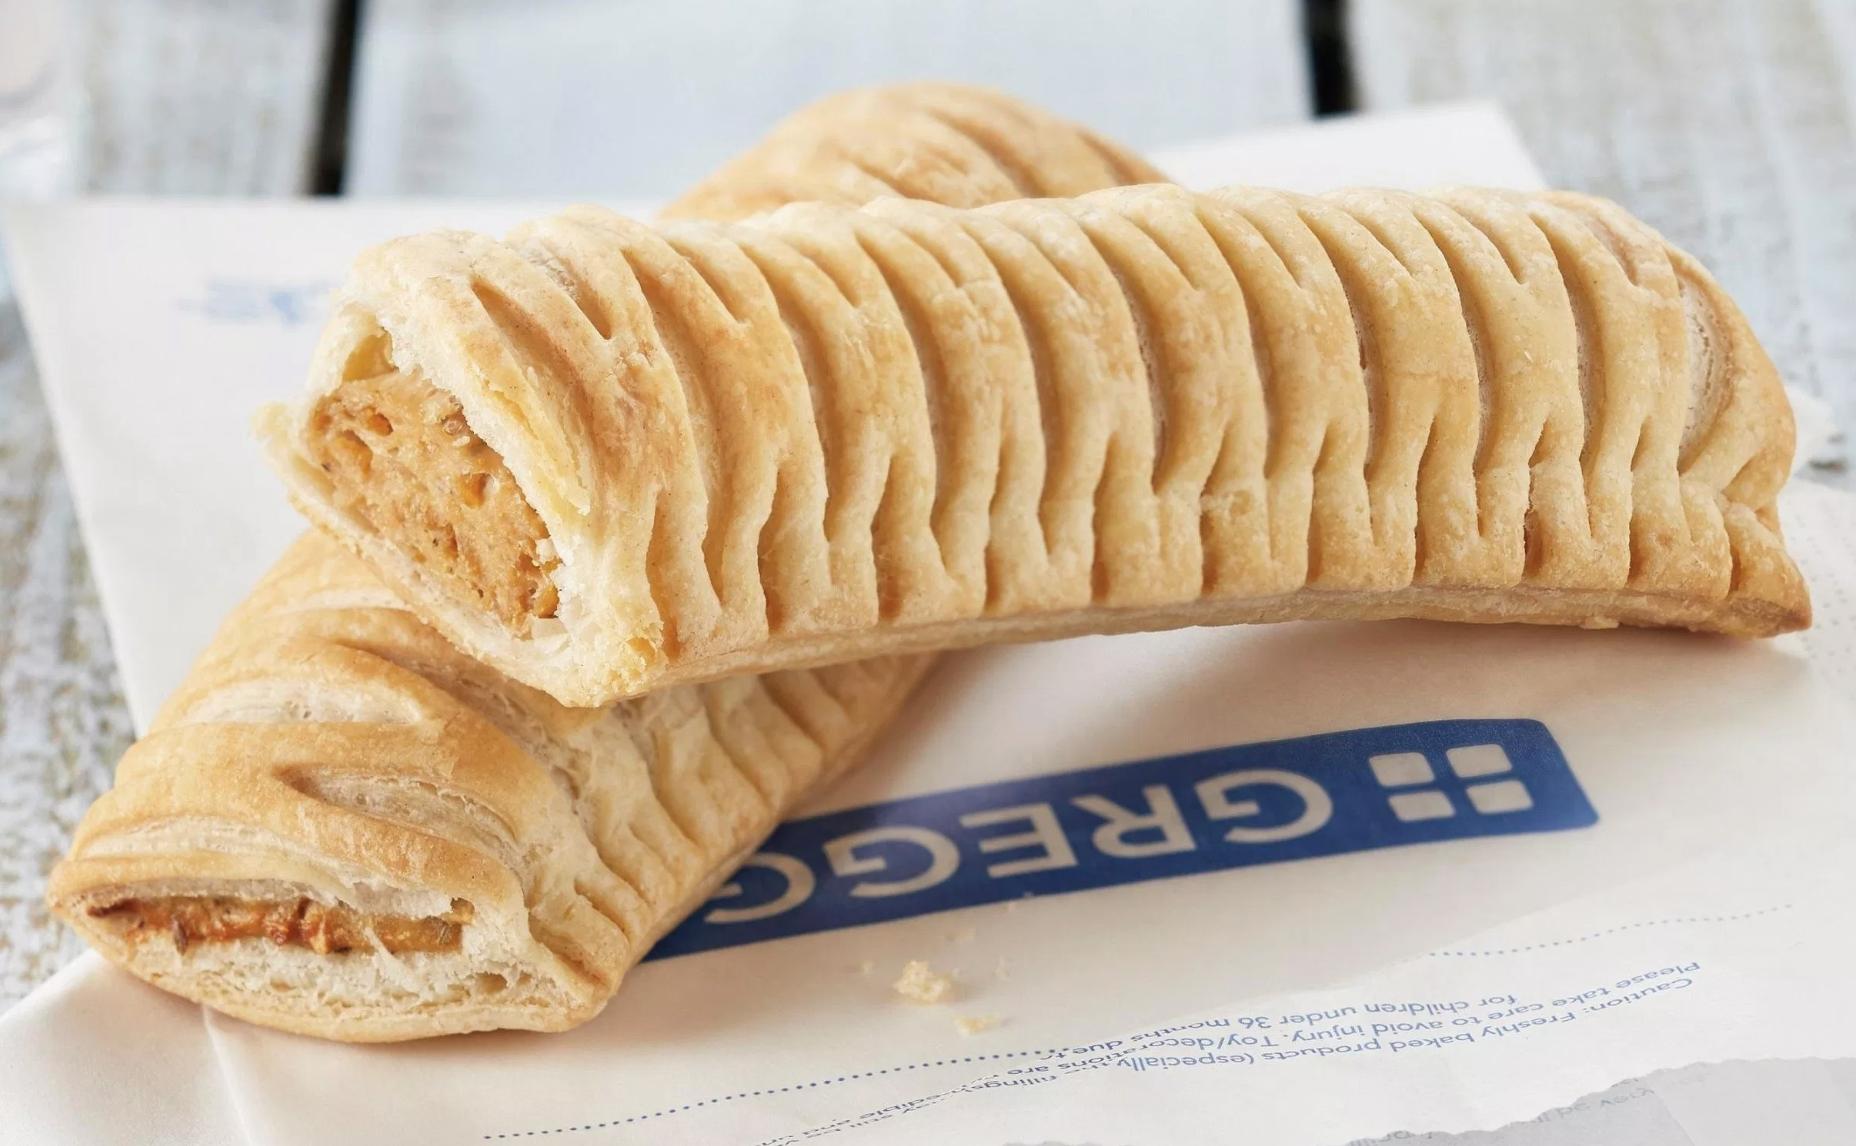 greggs profits rise thanks to vegan sausage roll